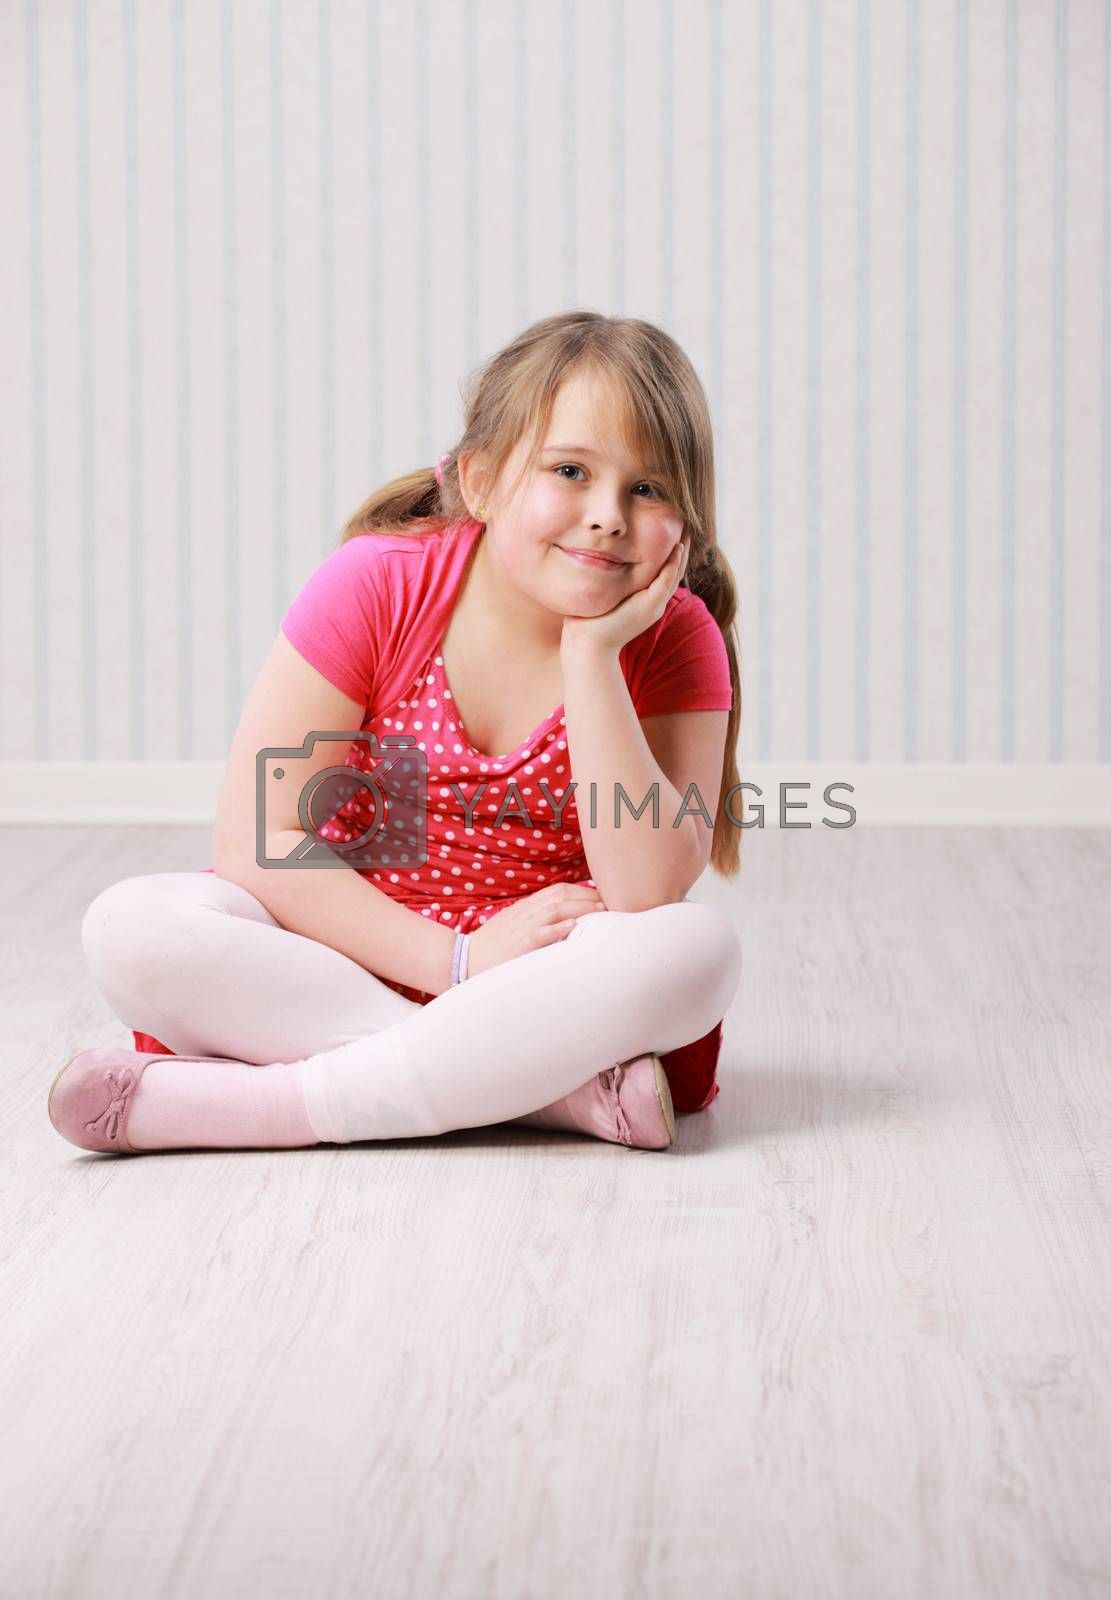 Portrait of a little beautiful girl sitting on floor